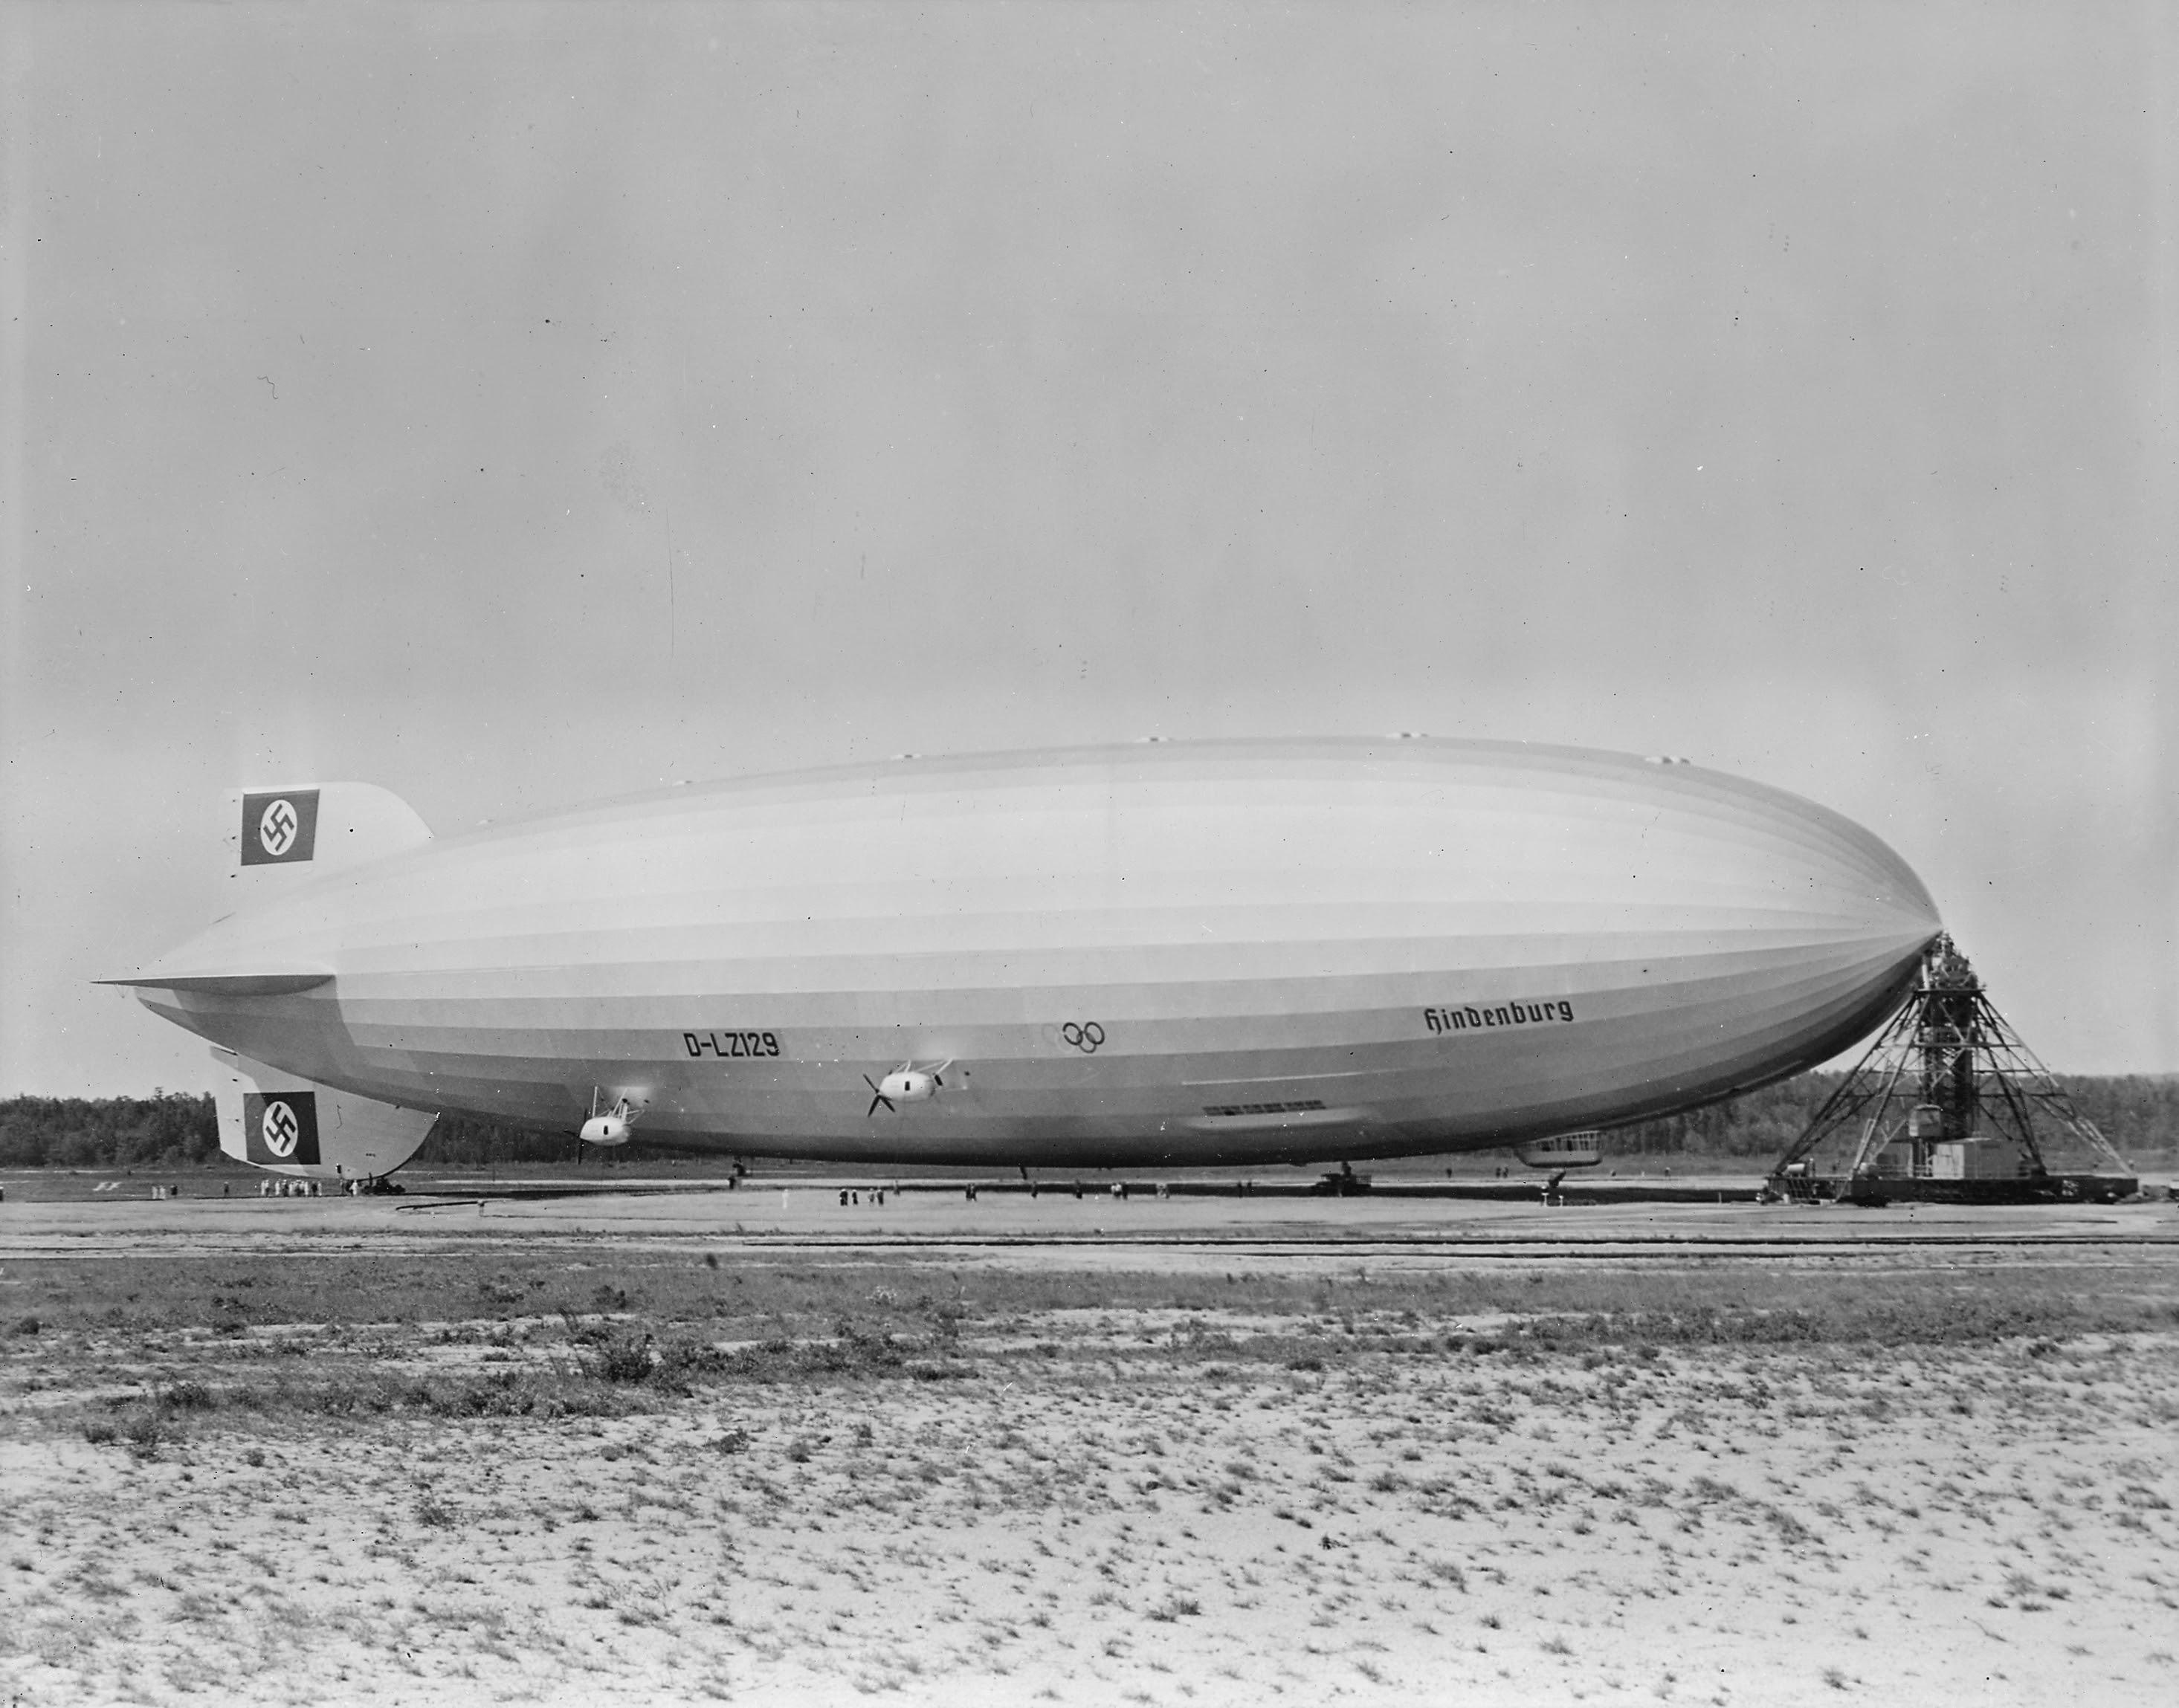 Ficheiro:Hindenburg at lakehurst.jpg